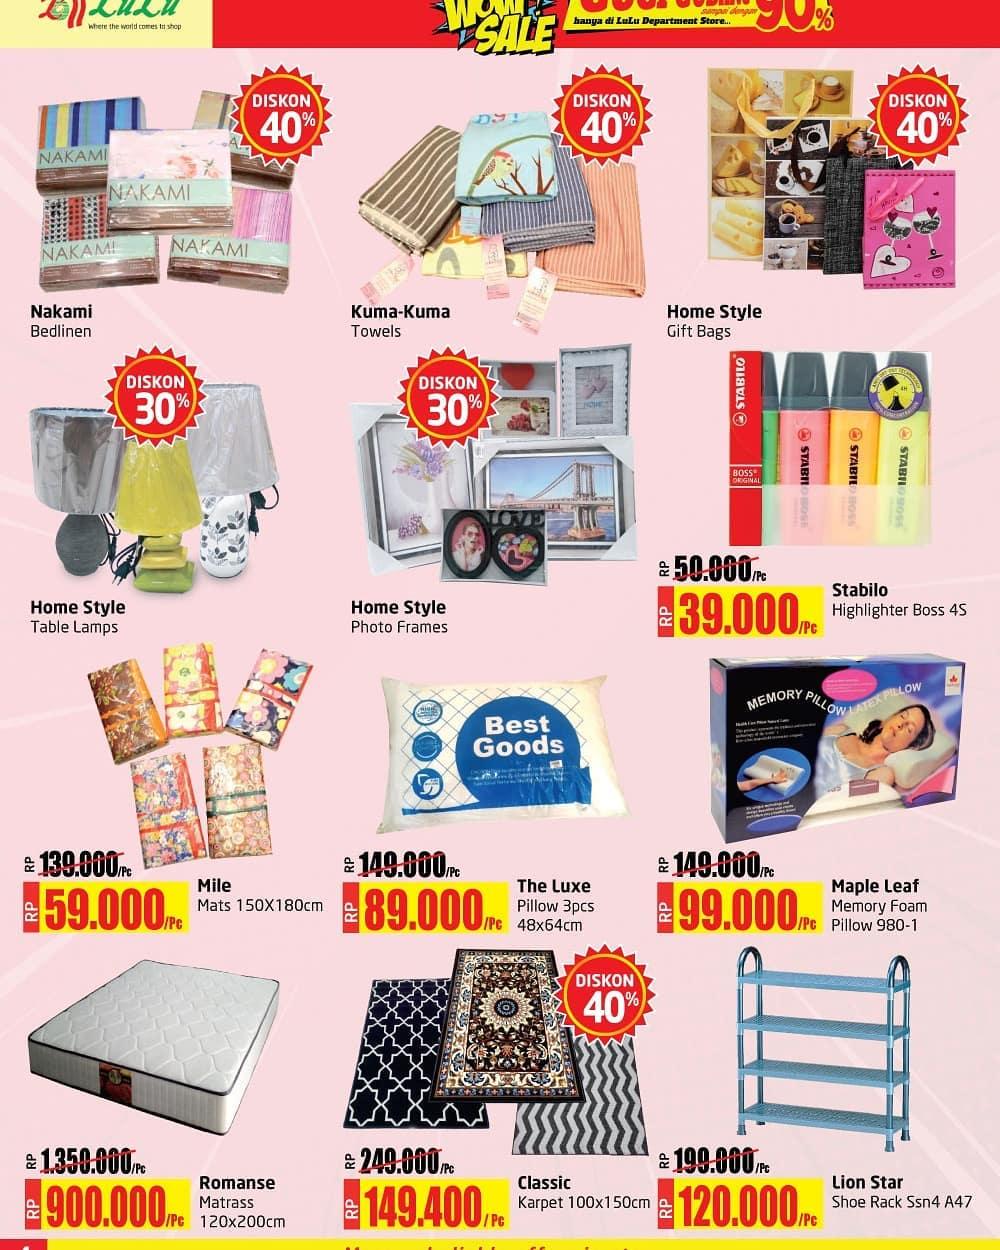 #LuluStore - #Pomo #Katalog Diskon Super WOW Periode 06 - 20 Maret 2019